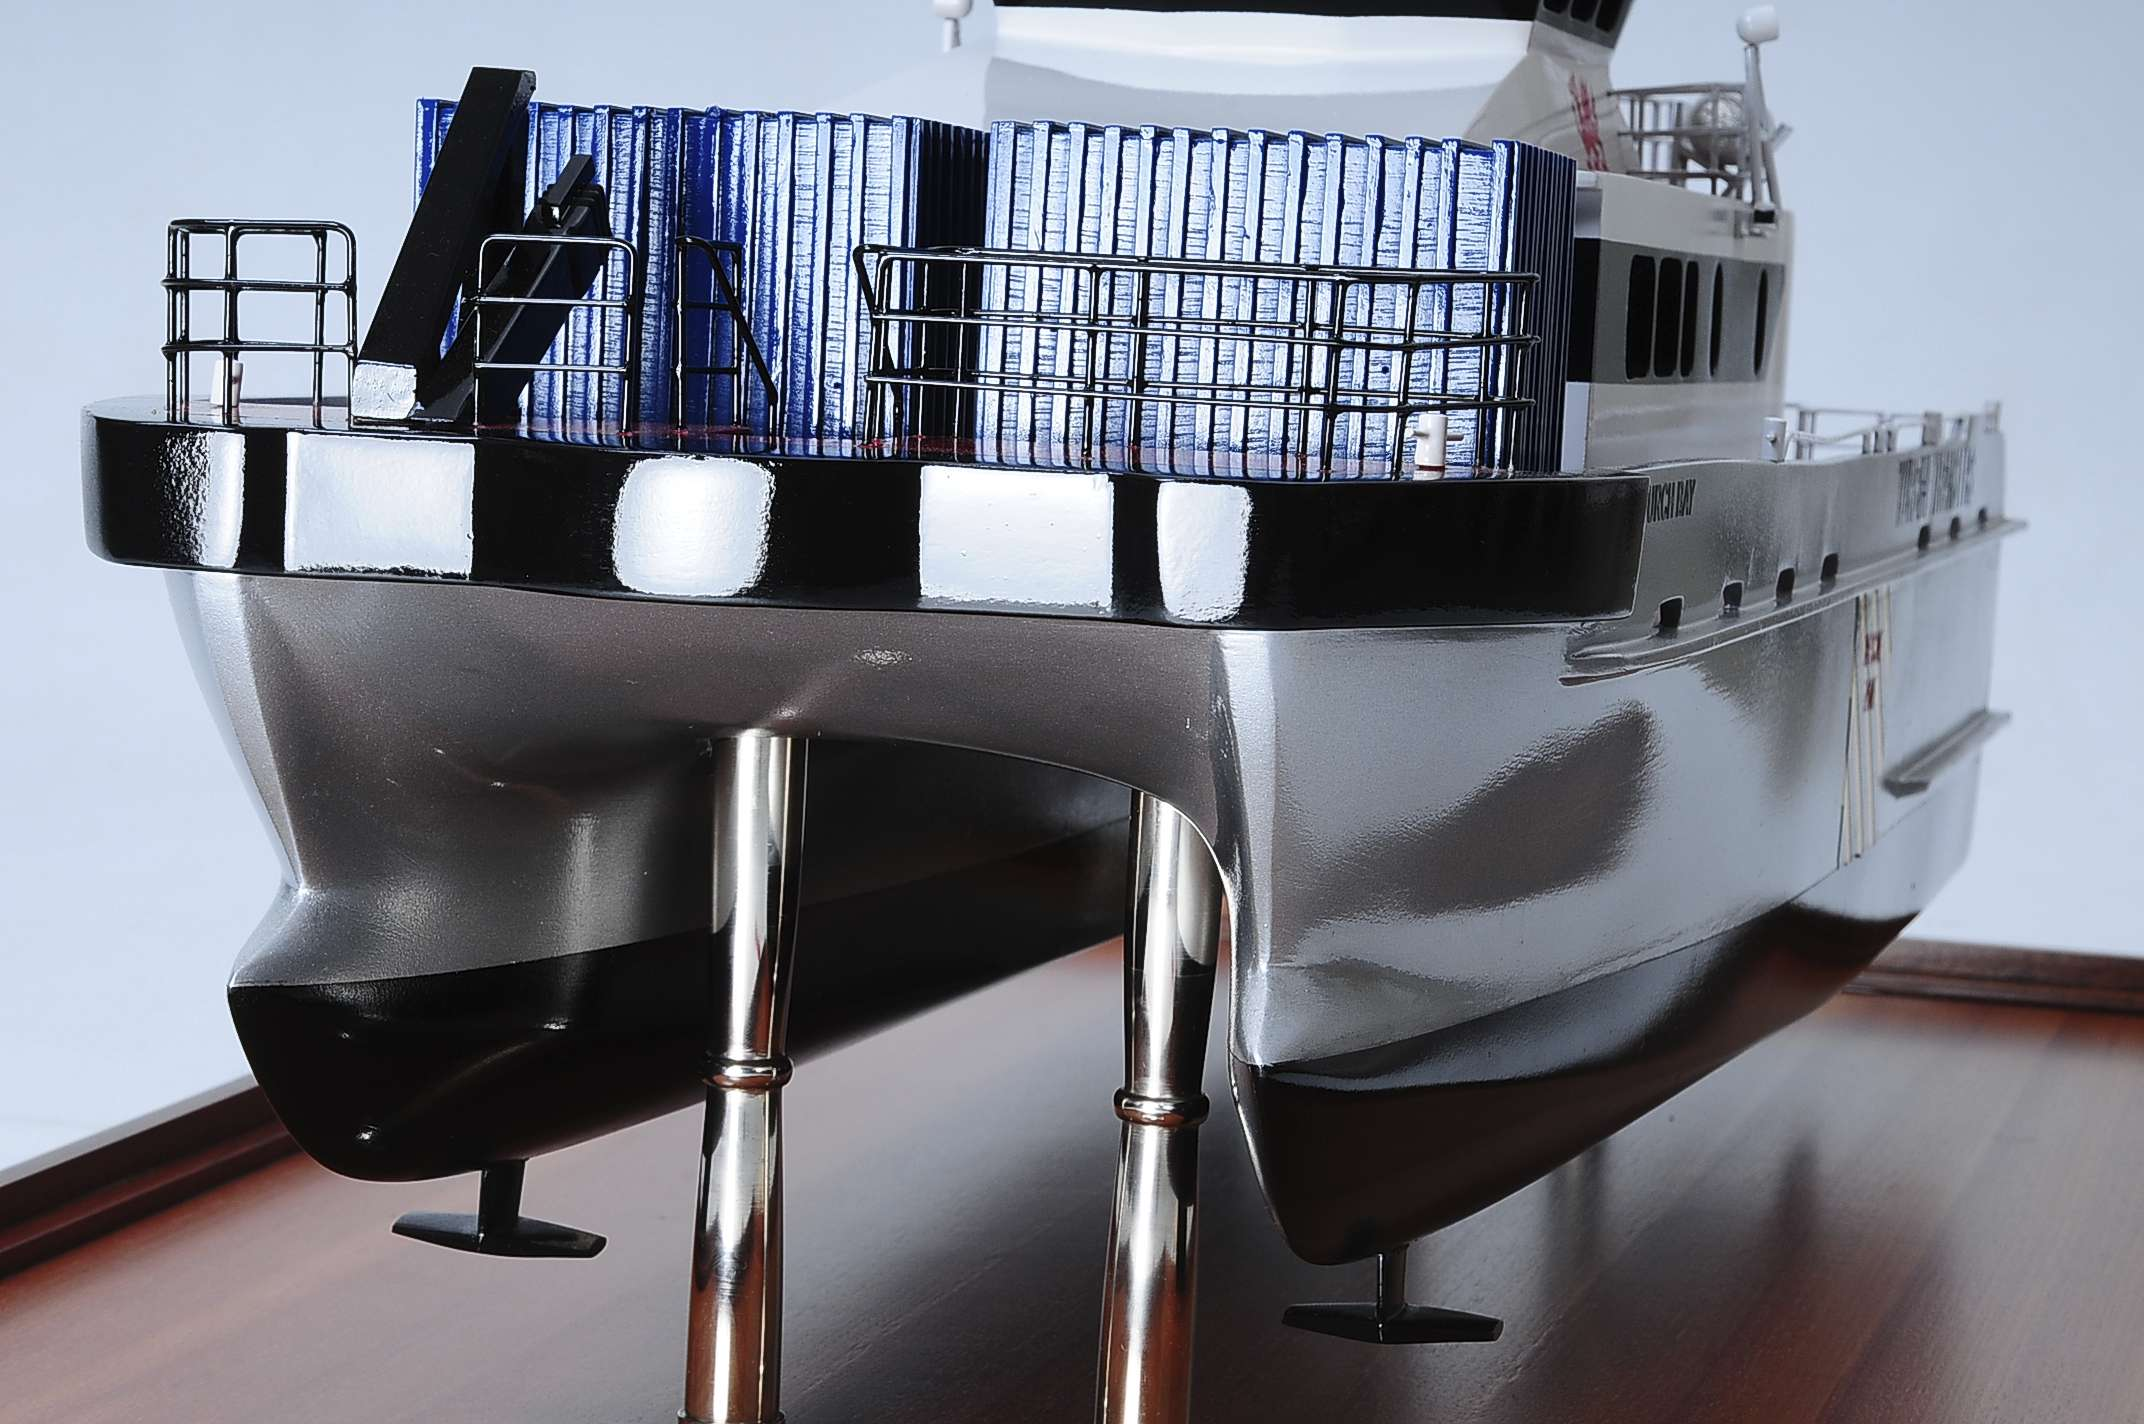 1439-4941-Turbine-Transfer-Catamaran-Model